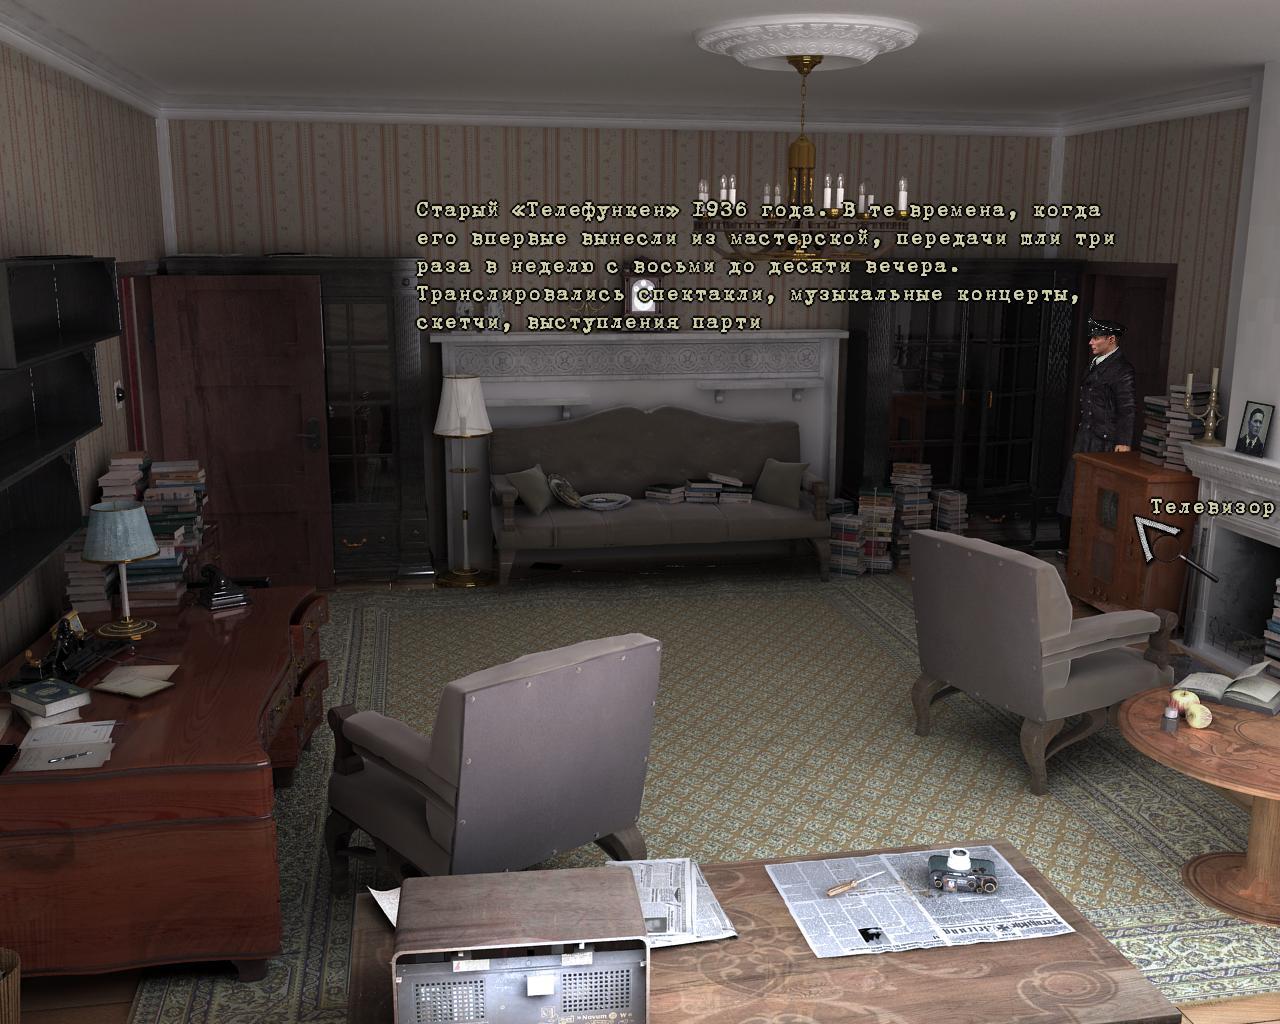 "A Stroke Of Fate 2 / Архивы НКВД: Охота на фюрера. Операция ""Бункер"" [Ru] (RePack) 2009 | SxSxL"